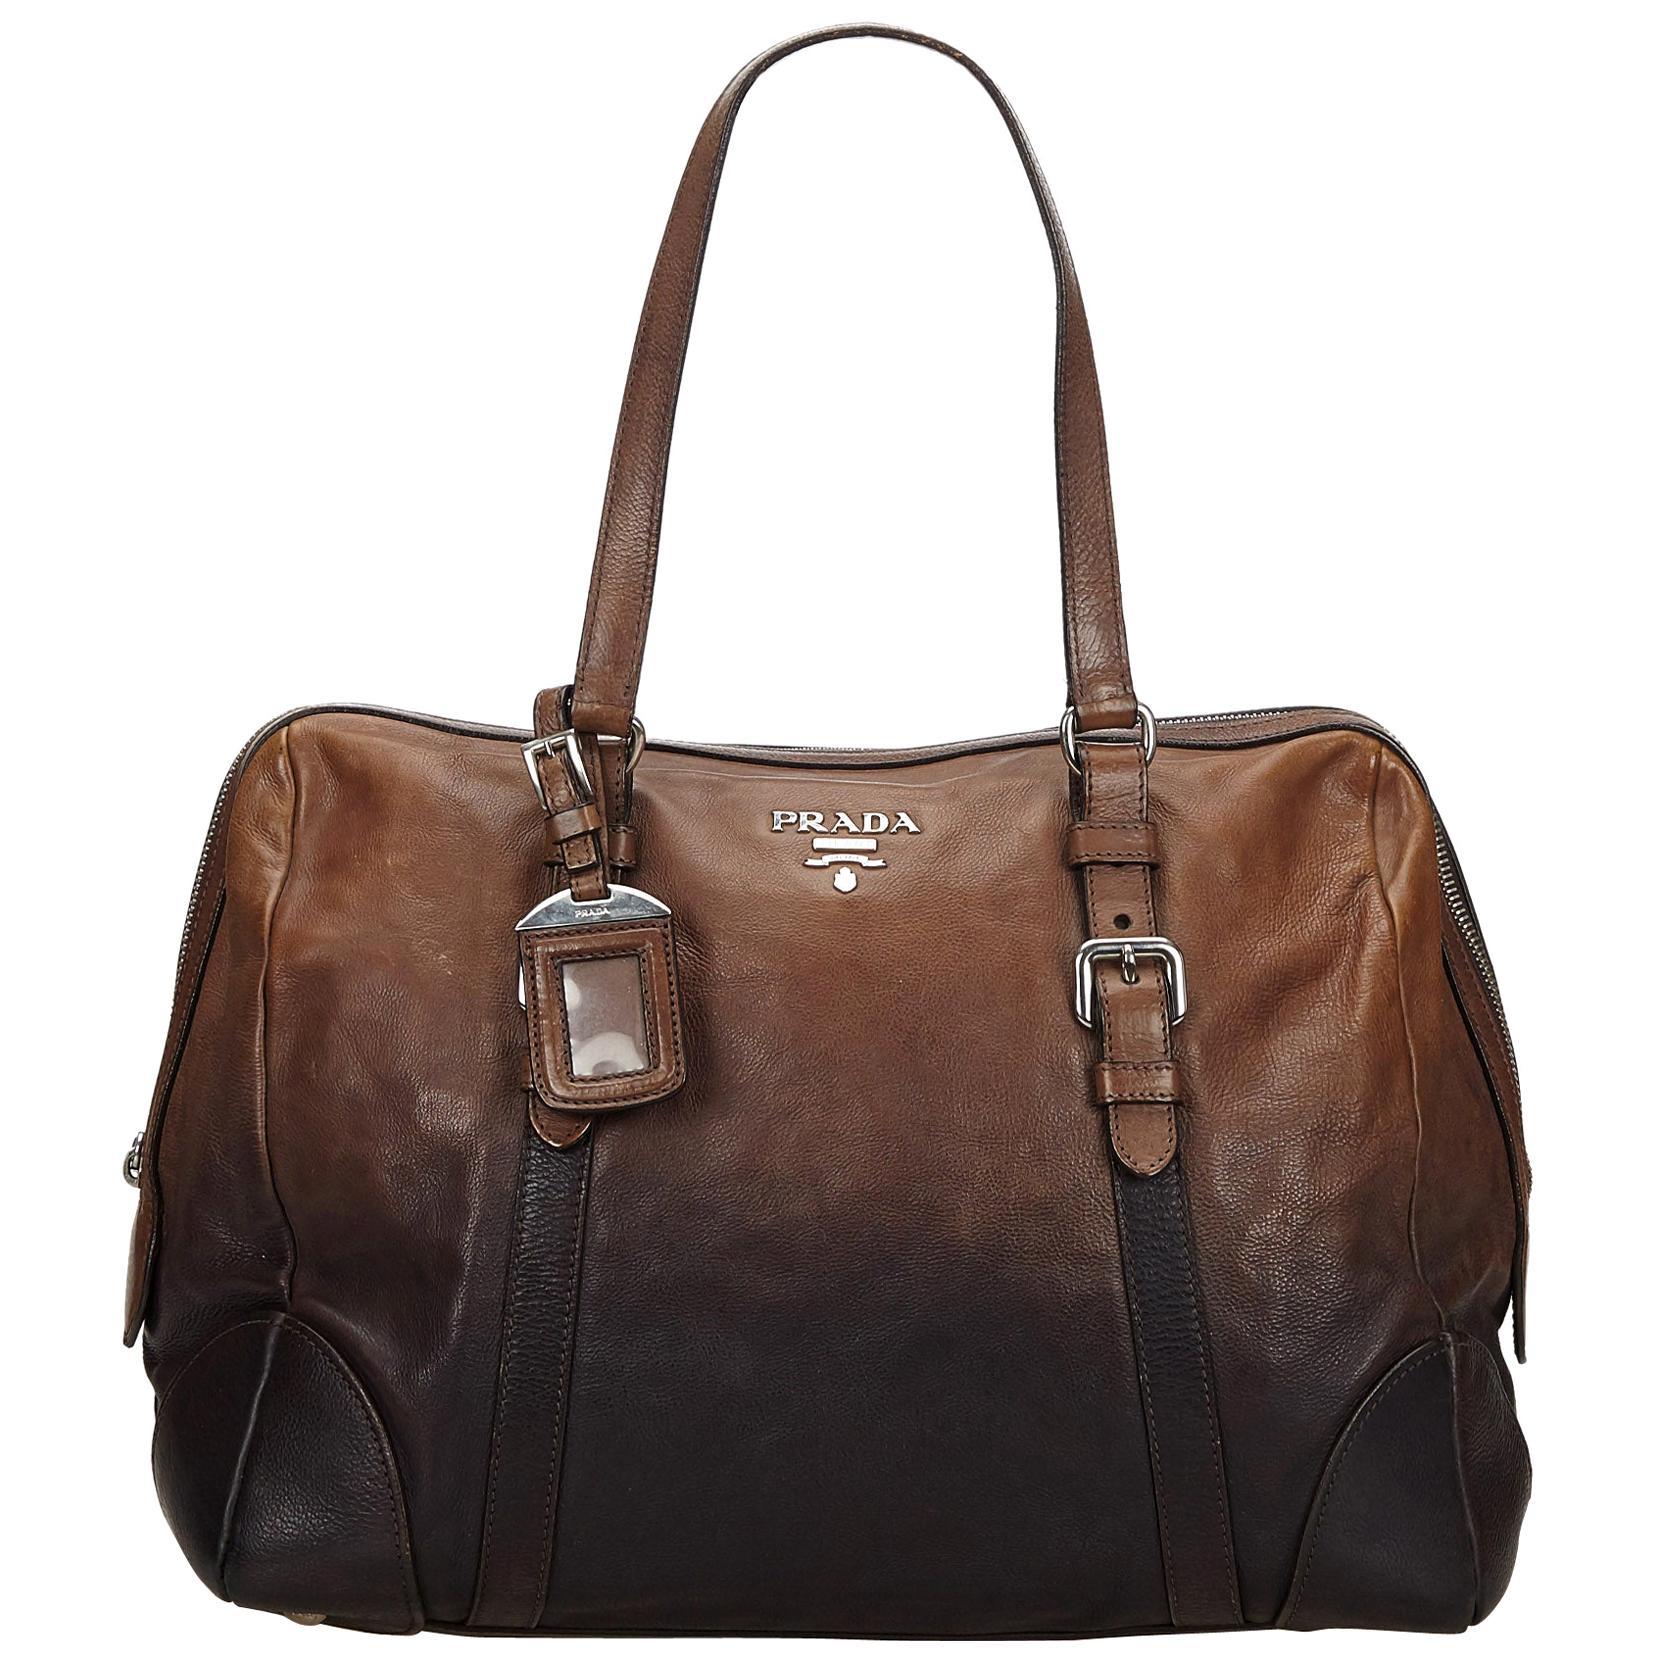 eee0610e78eb Vintage Prada Handbags and Purses - 1,325 For Sale at 1stdibs